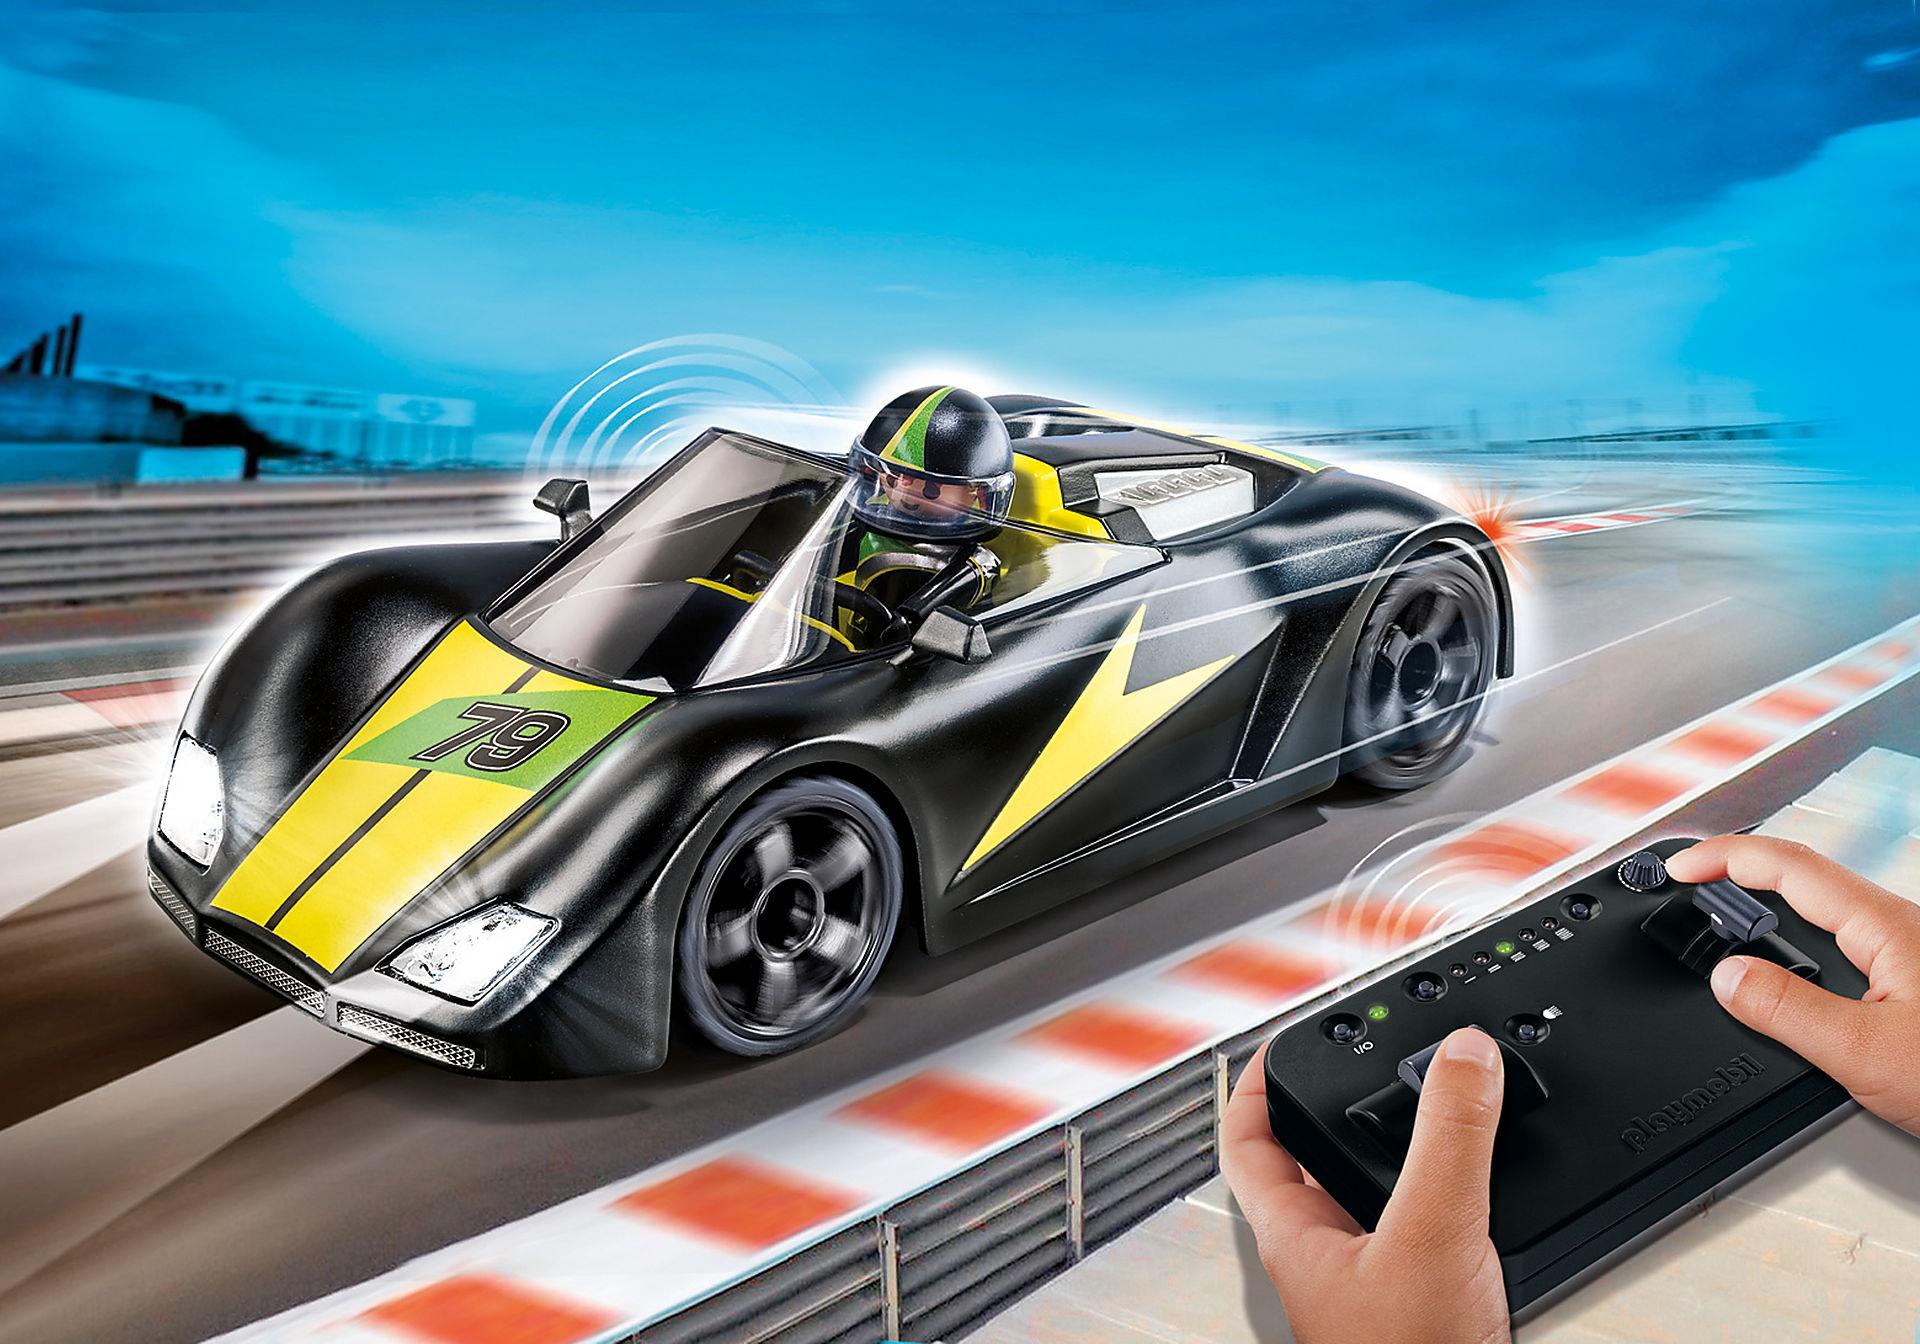 9089 Racer Desportivo RC  zoom image1